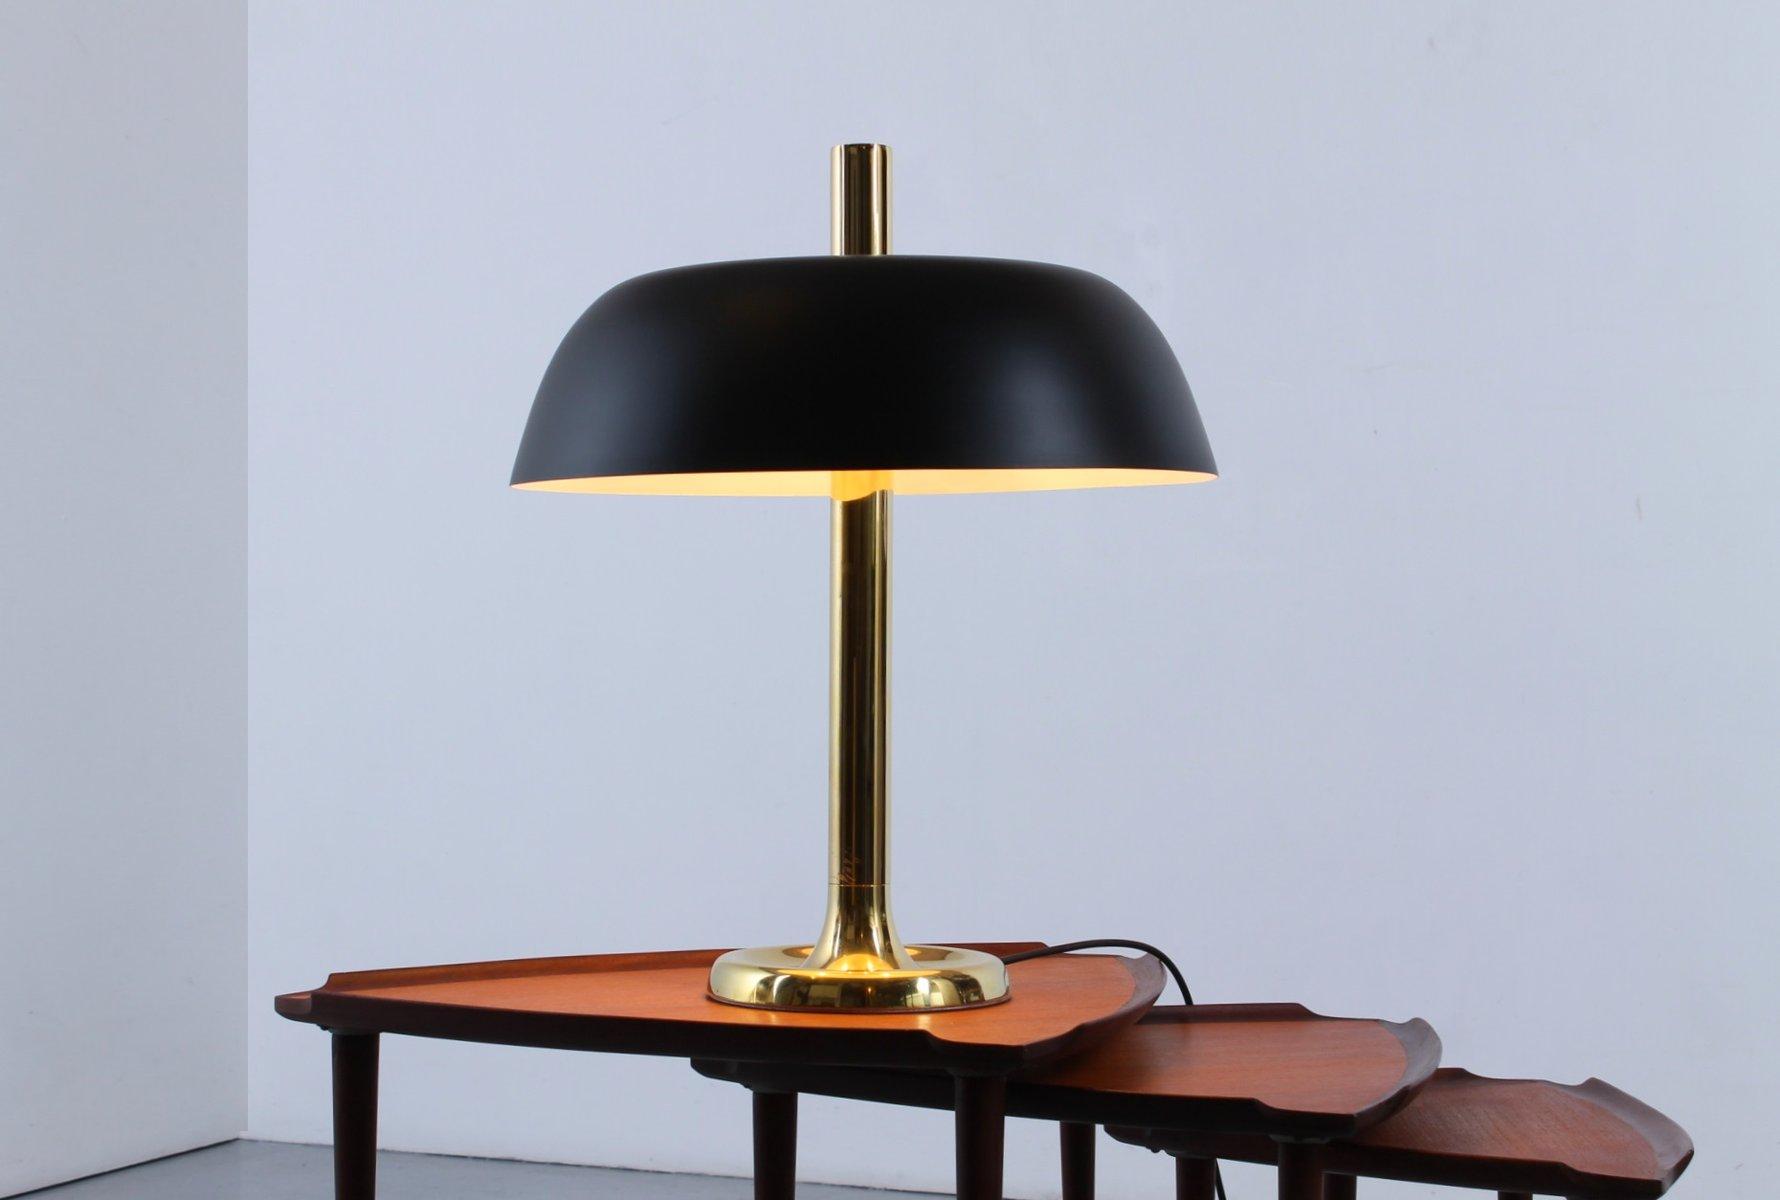 tischlampe mit schwarzem schirm in pilz optik s ule aus. Black Bedroom Furniture Sets. Home Design Ideas